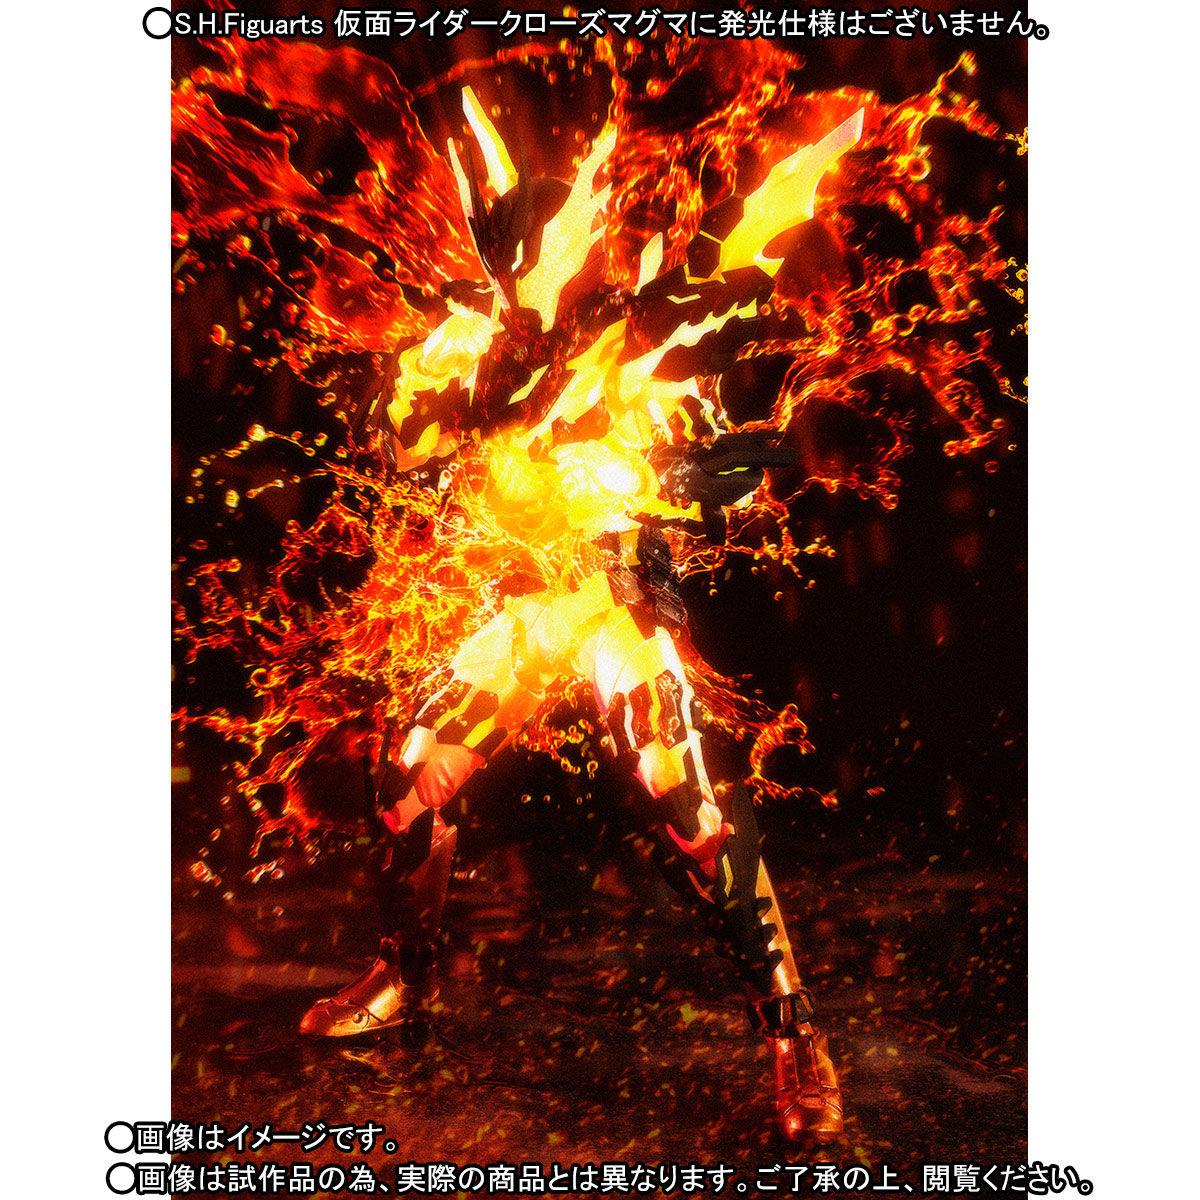 S.H.フィギュアーツ『仮面ライダー クローズマグマ』可動フィギュア-007